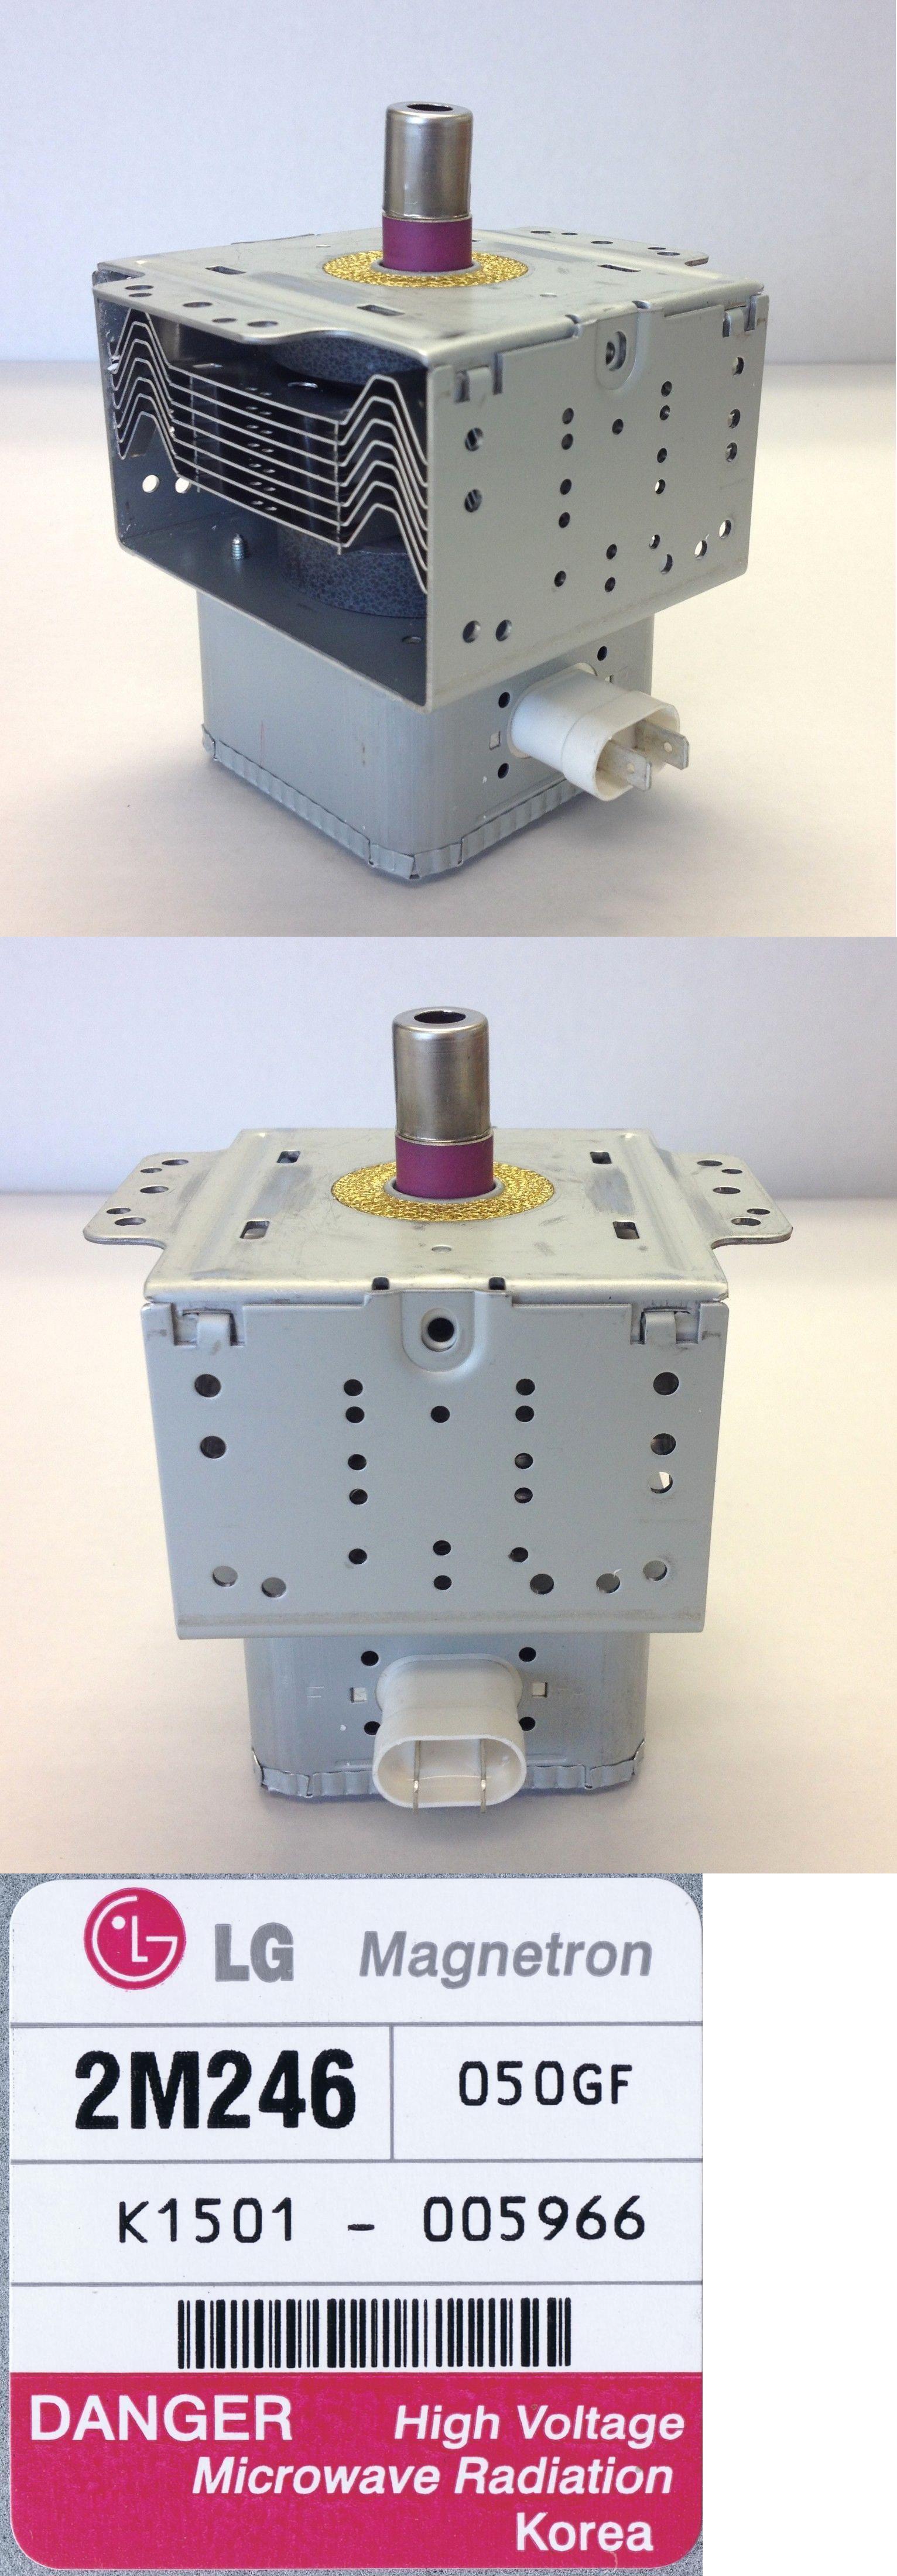 2m246 050gf microwave magnetron tube